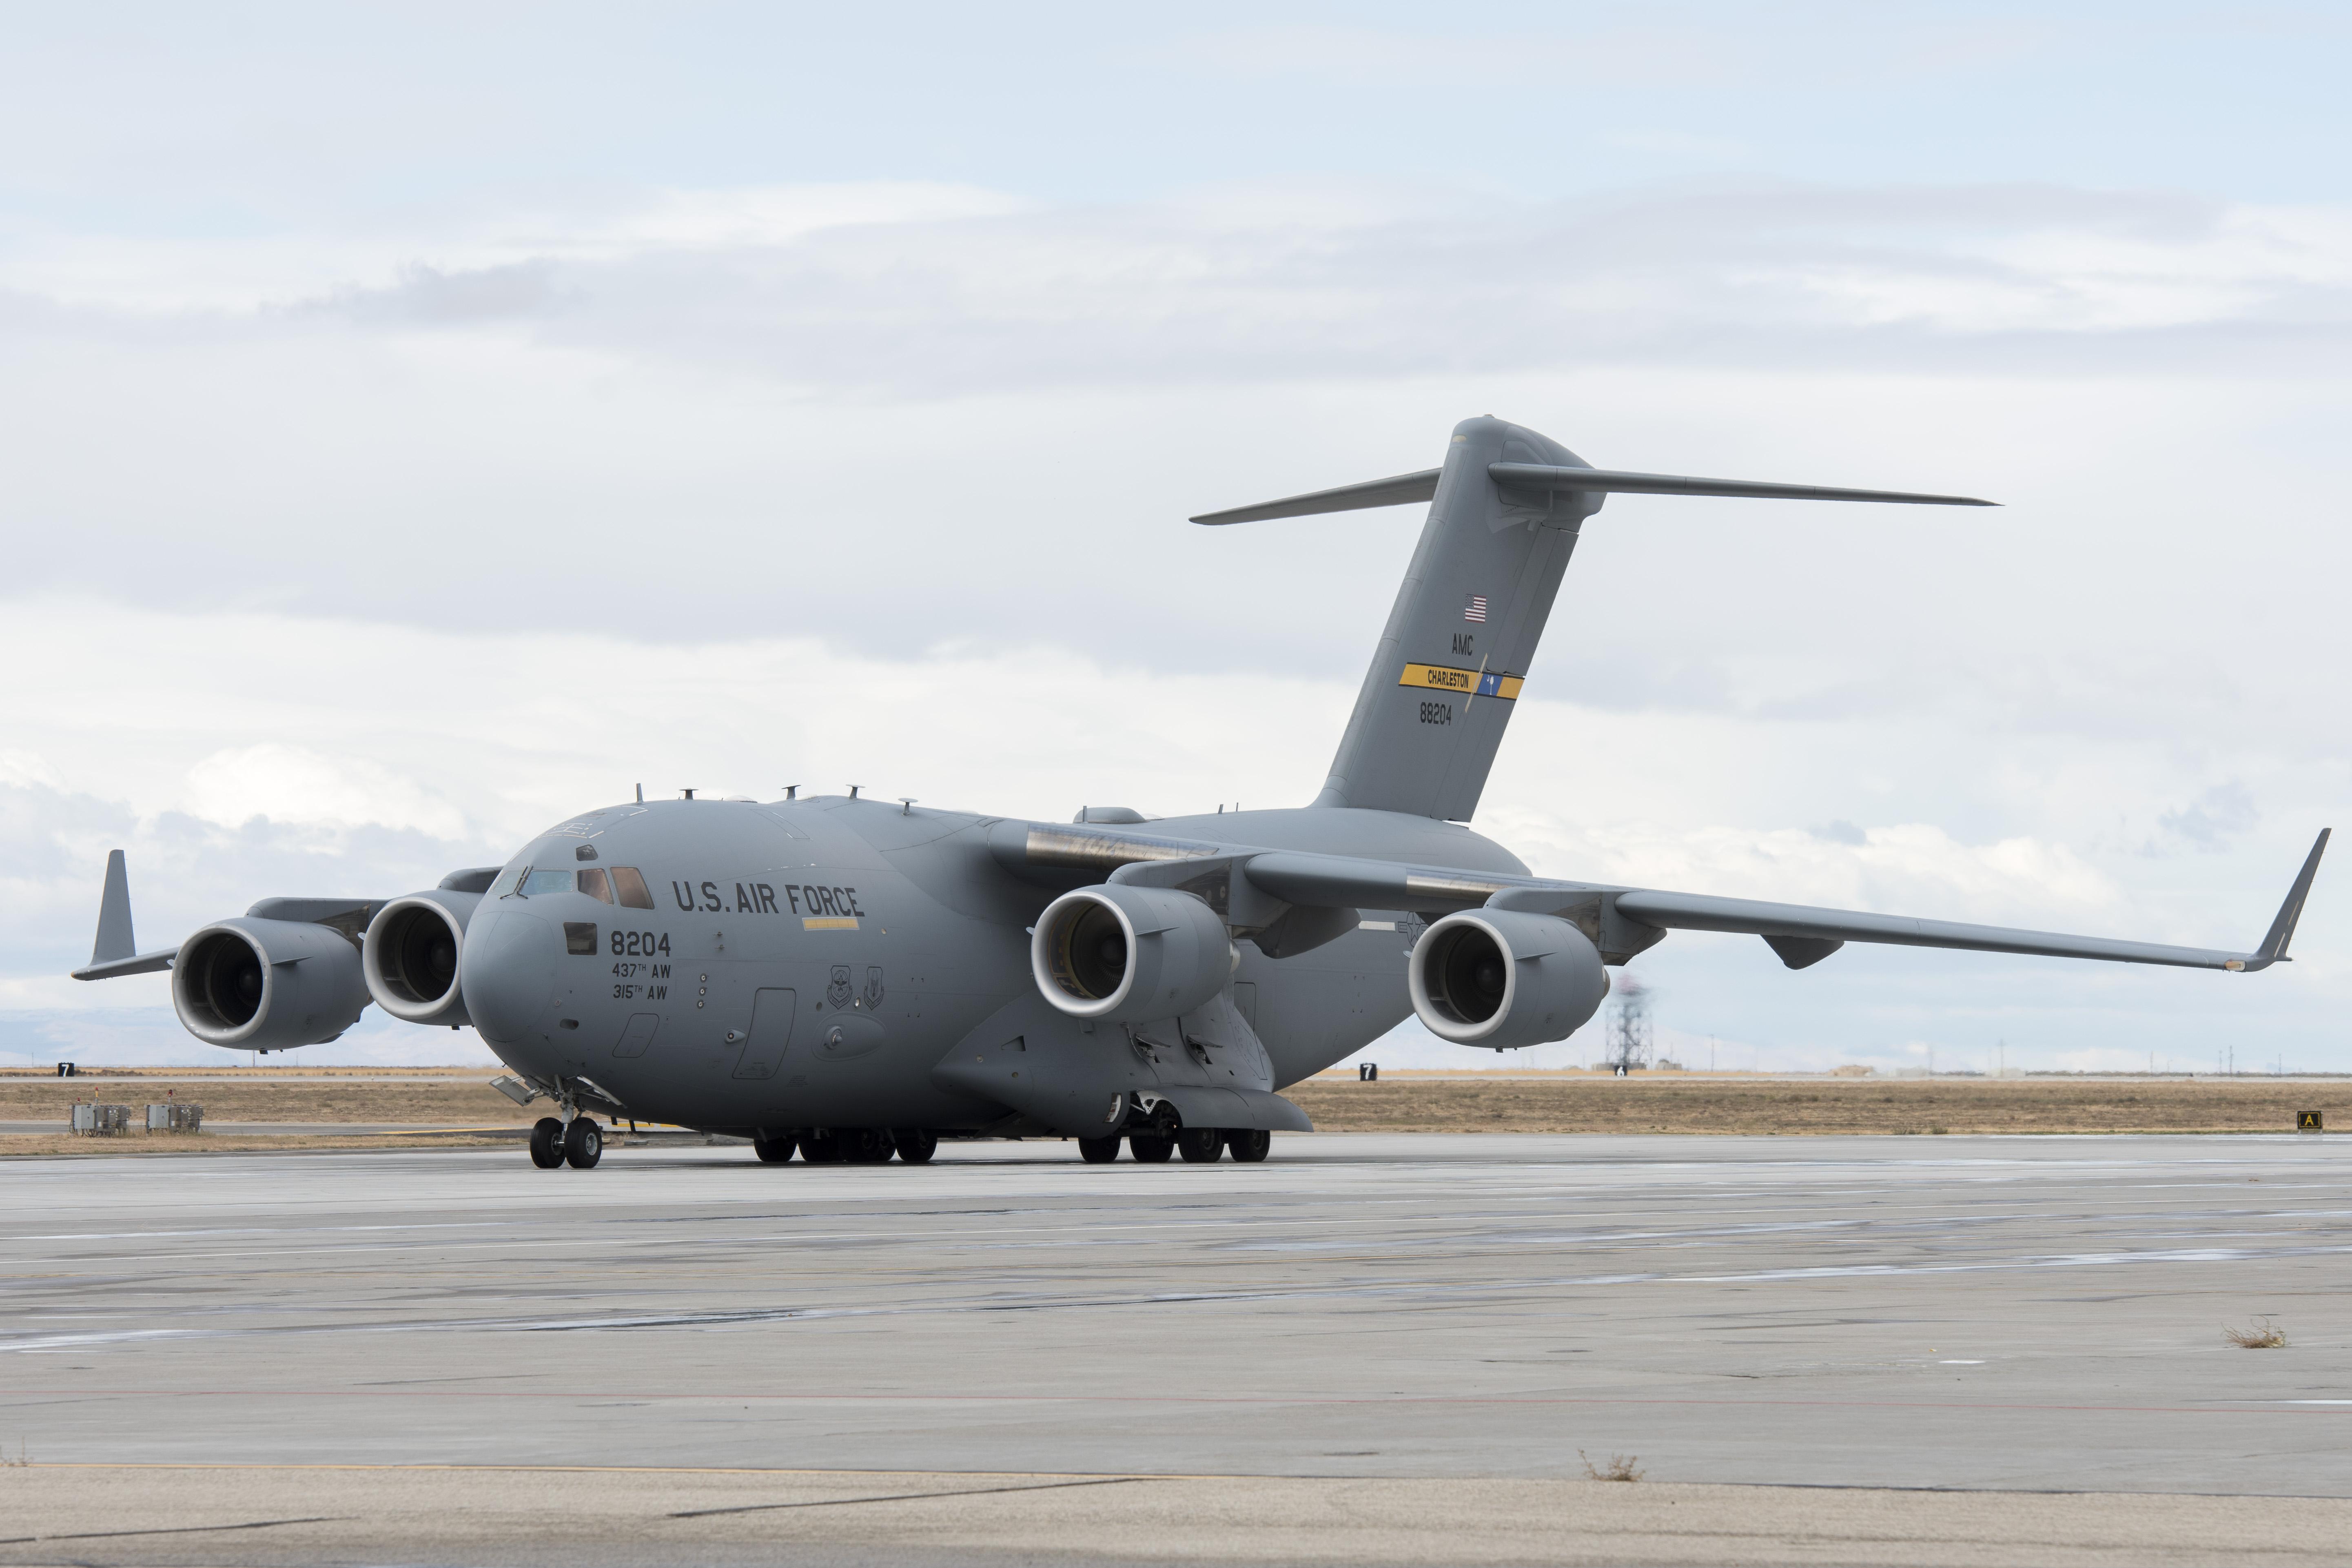 171020 F IX896 019 mountain home air force base \u003e home  at virtualis.co